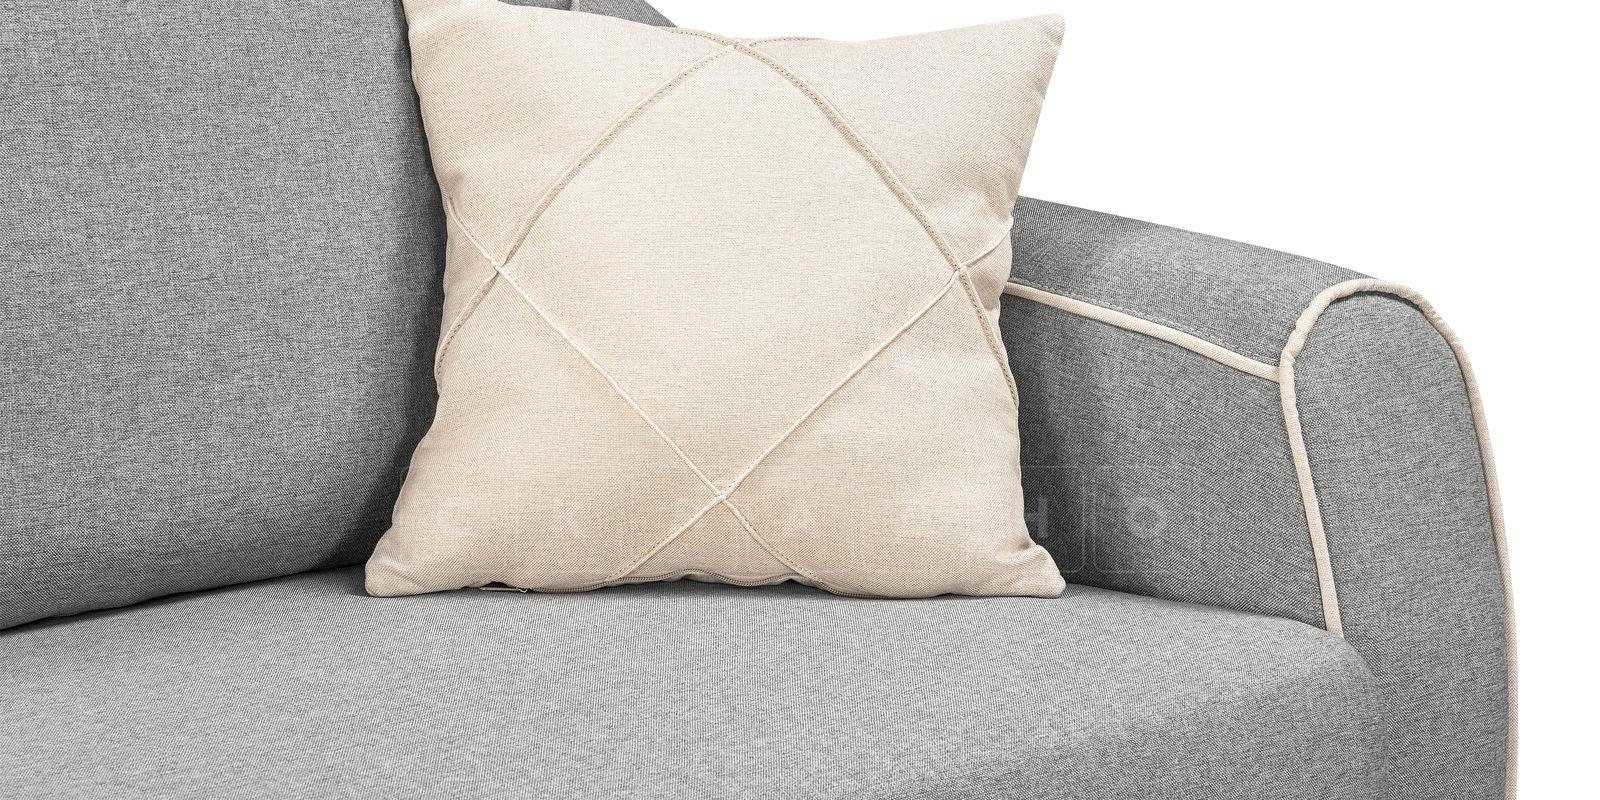 Диван Флэтфорд рогожка серый цвет фото 6 | интернет-магазин Складно